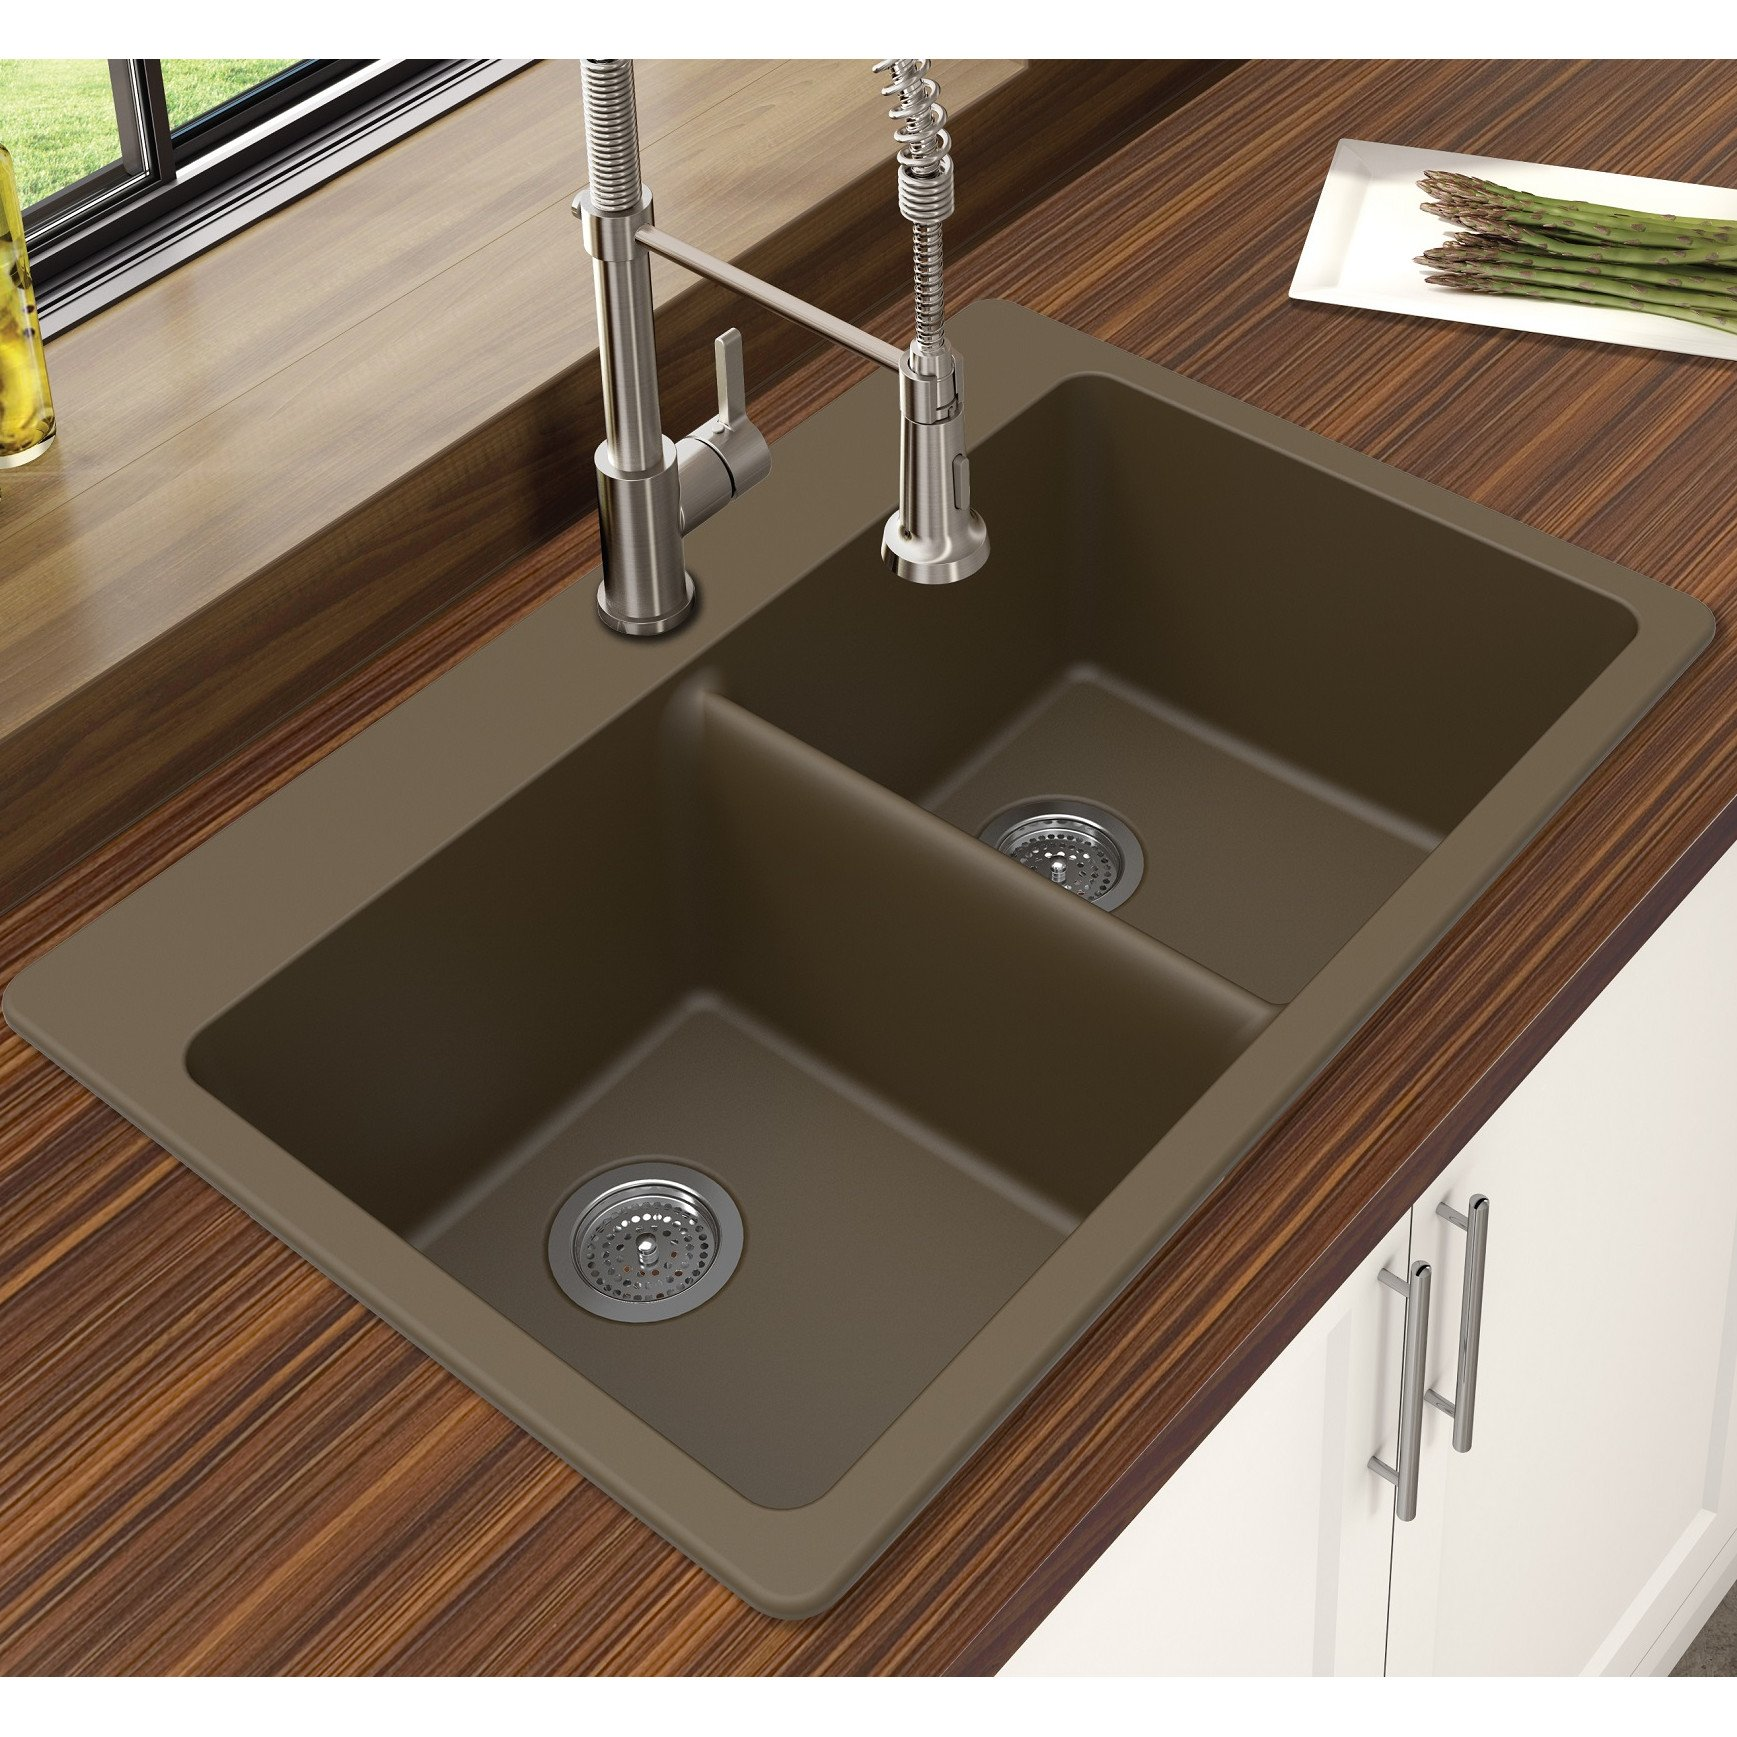 Winpro New Mocha Granite Quartz 33'' x 22'' x 9-1/2'' Equal Double Bowl Dual Mount Sink